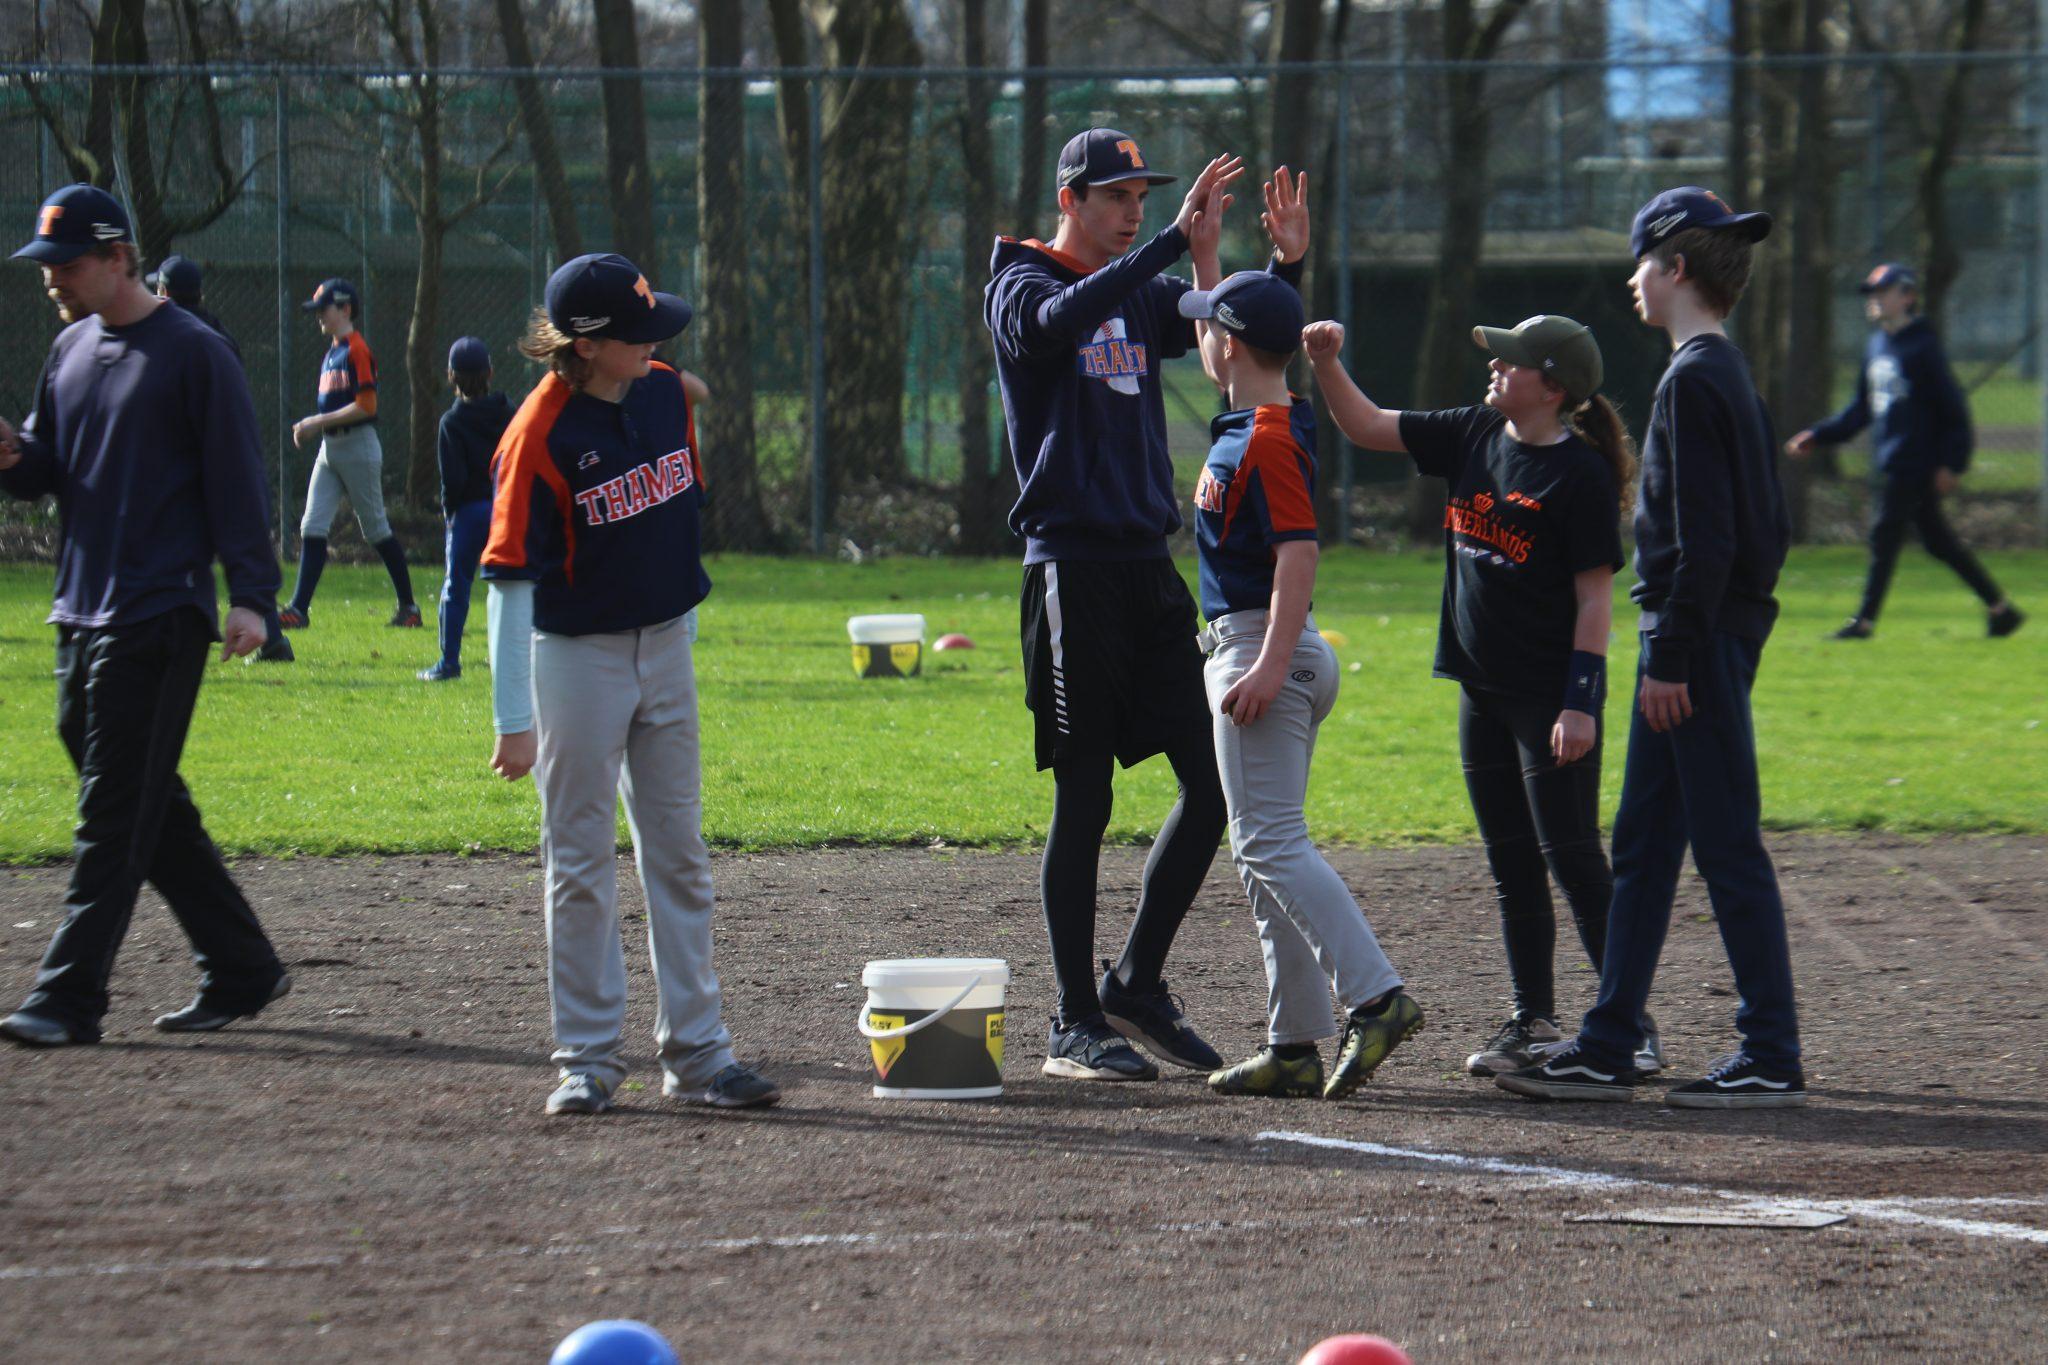 Baseball5 groot succes